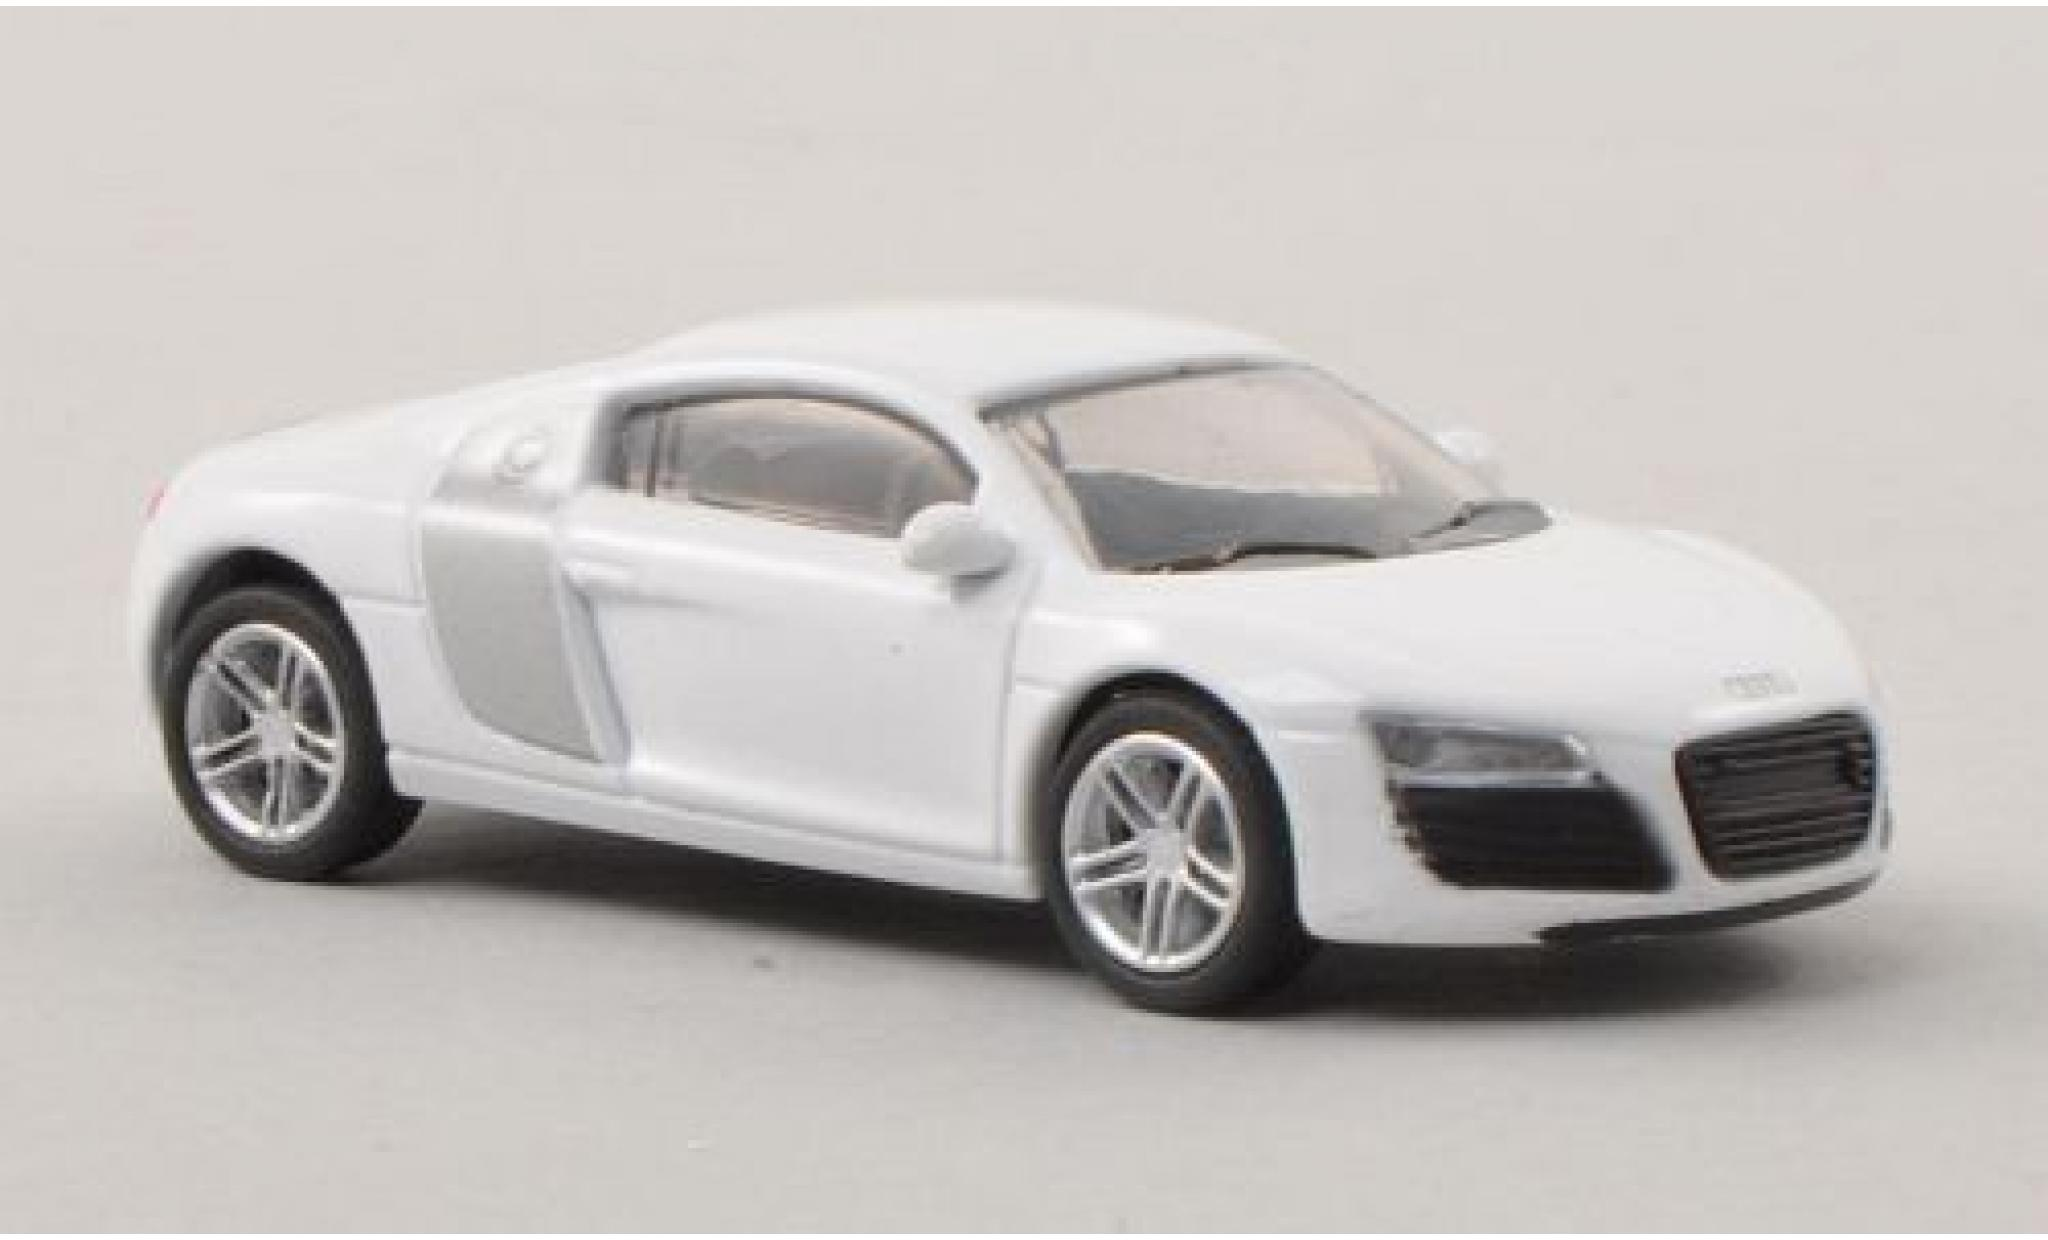 Audi R8 1/87 Schuco white/grey